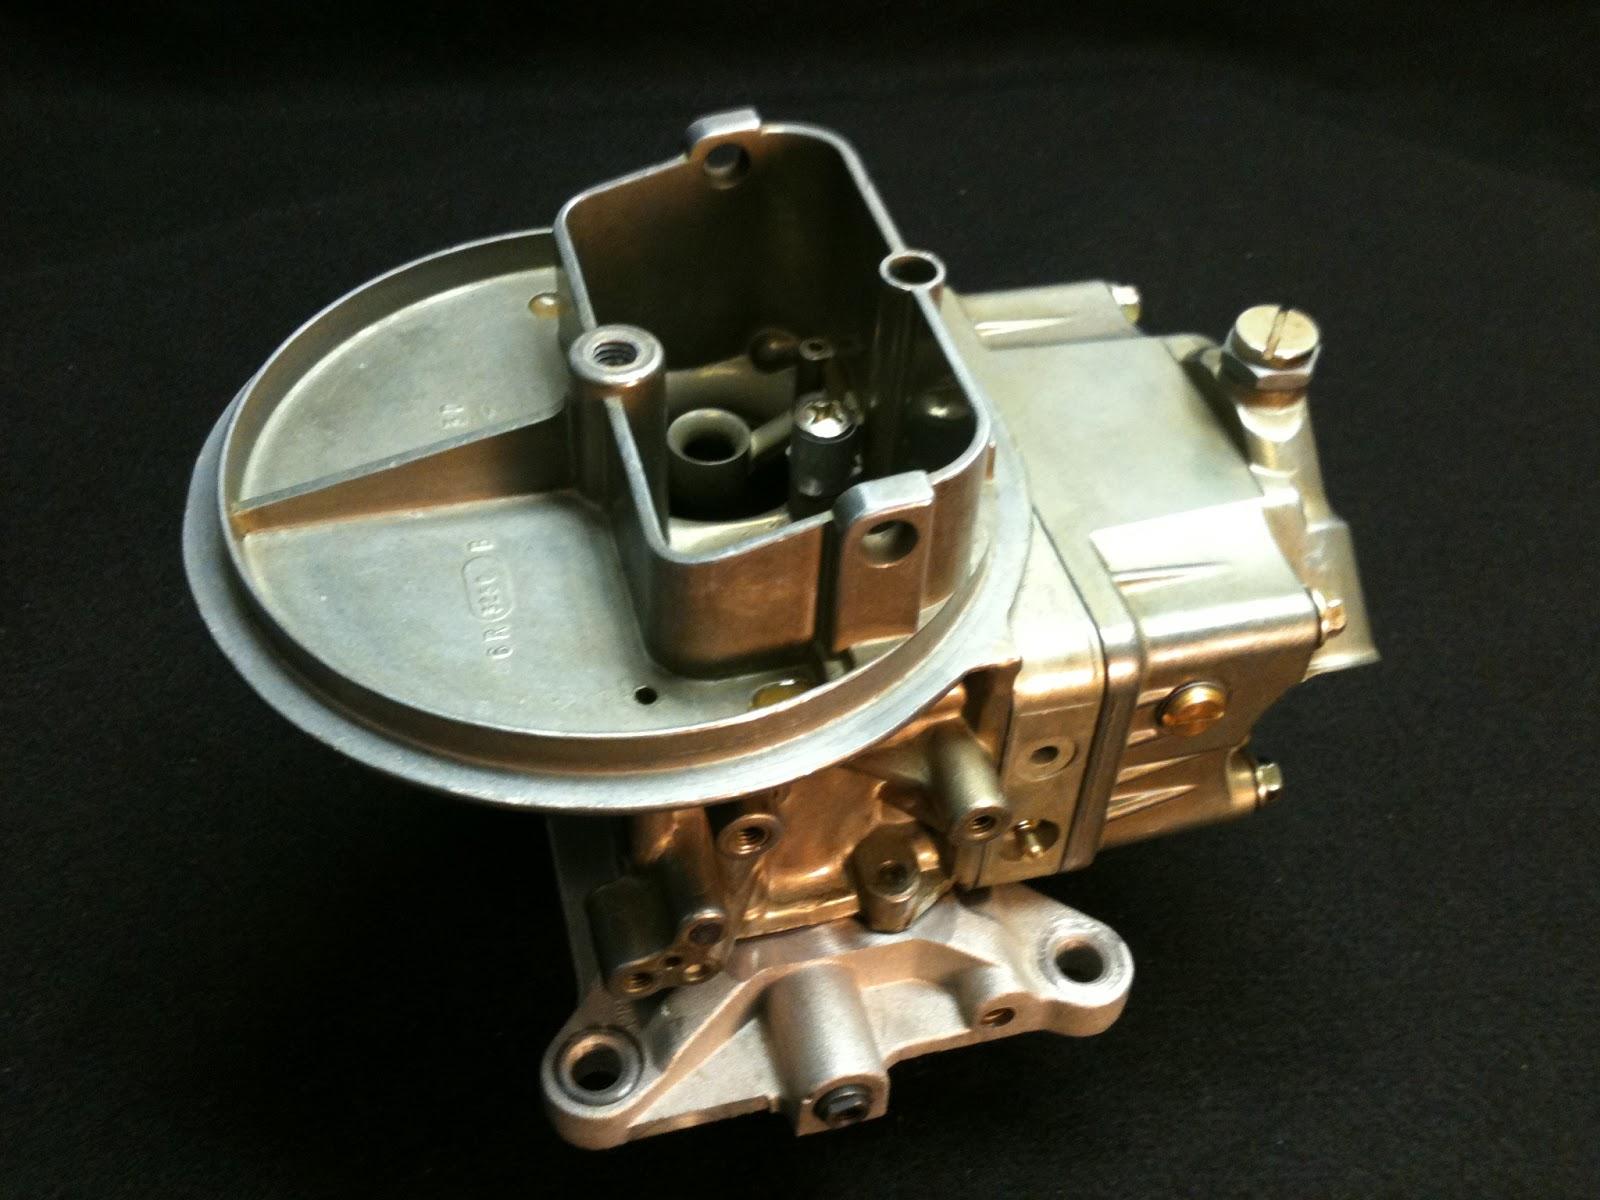 TMP Carbs Racing Automobile Holley Carburetors - Mostly Made